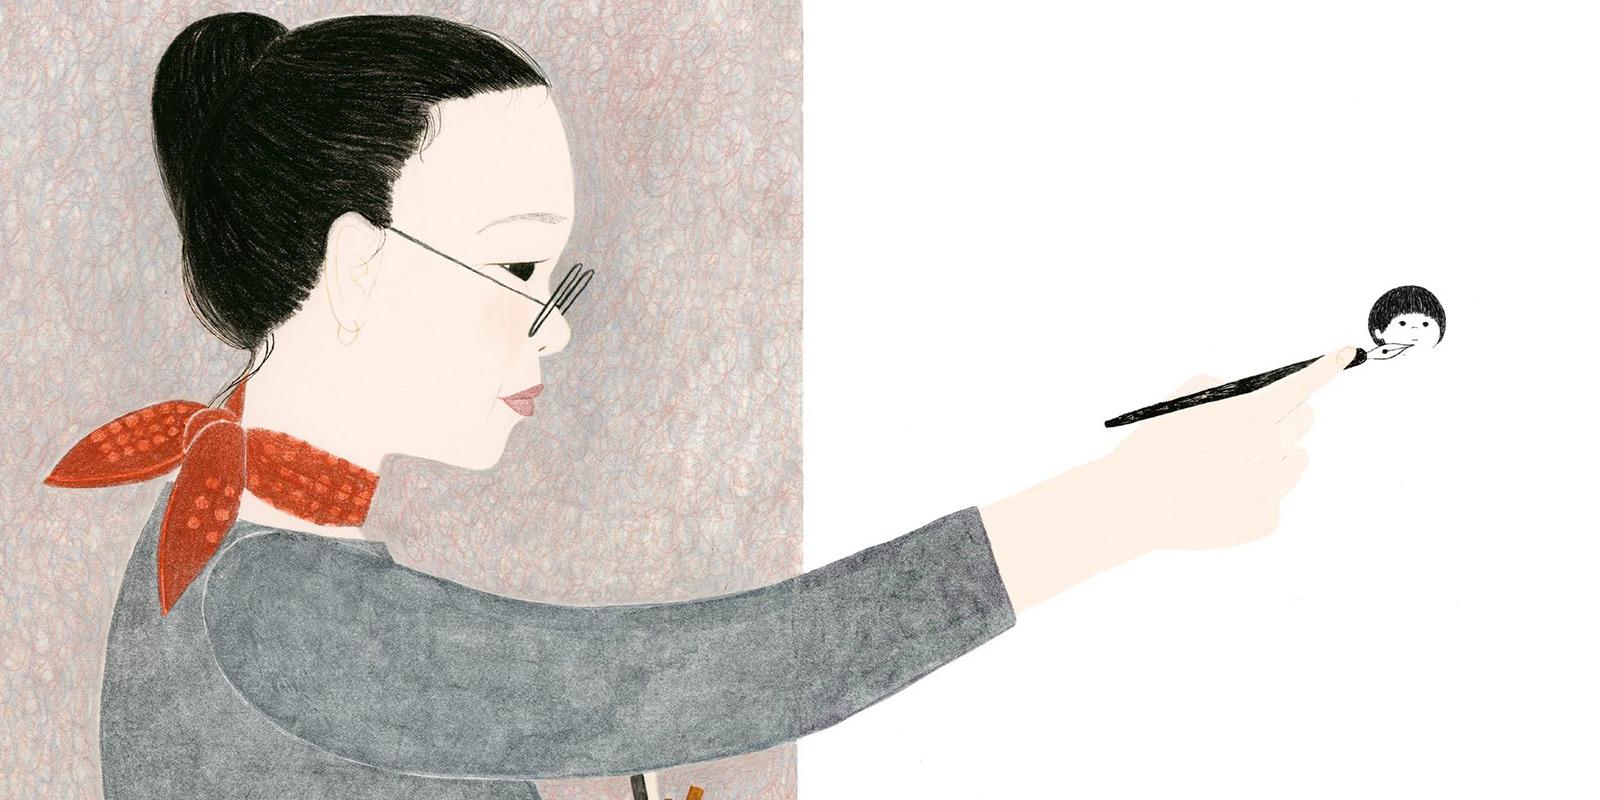 Illustration depicting Gyo Fujikawa drawing a head